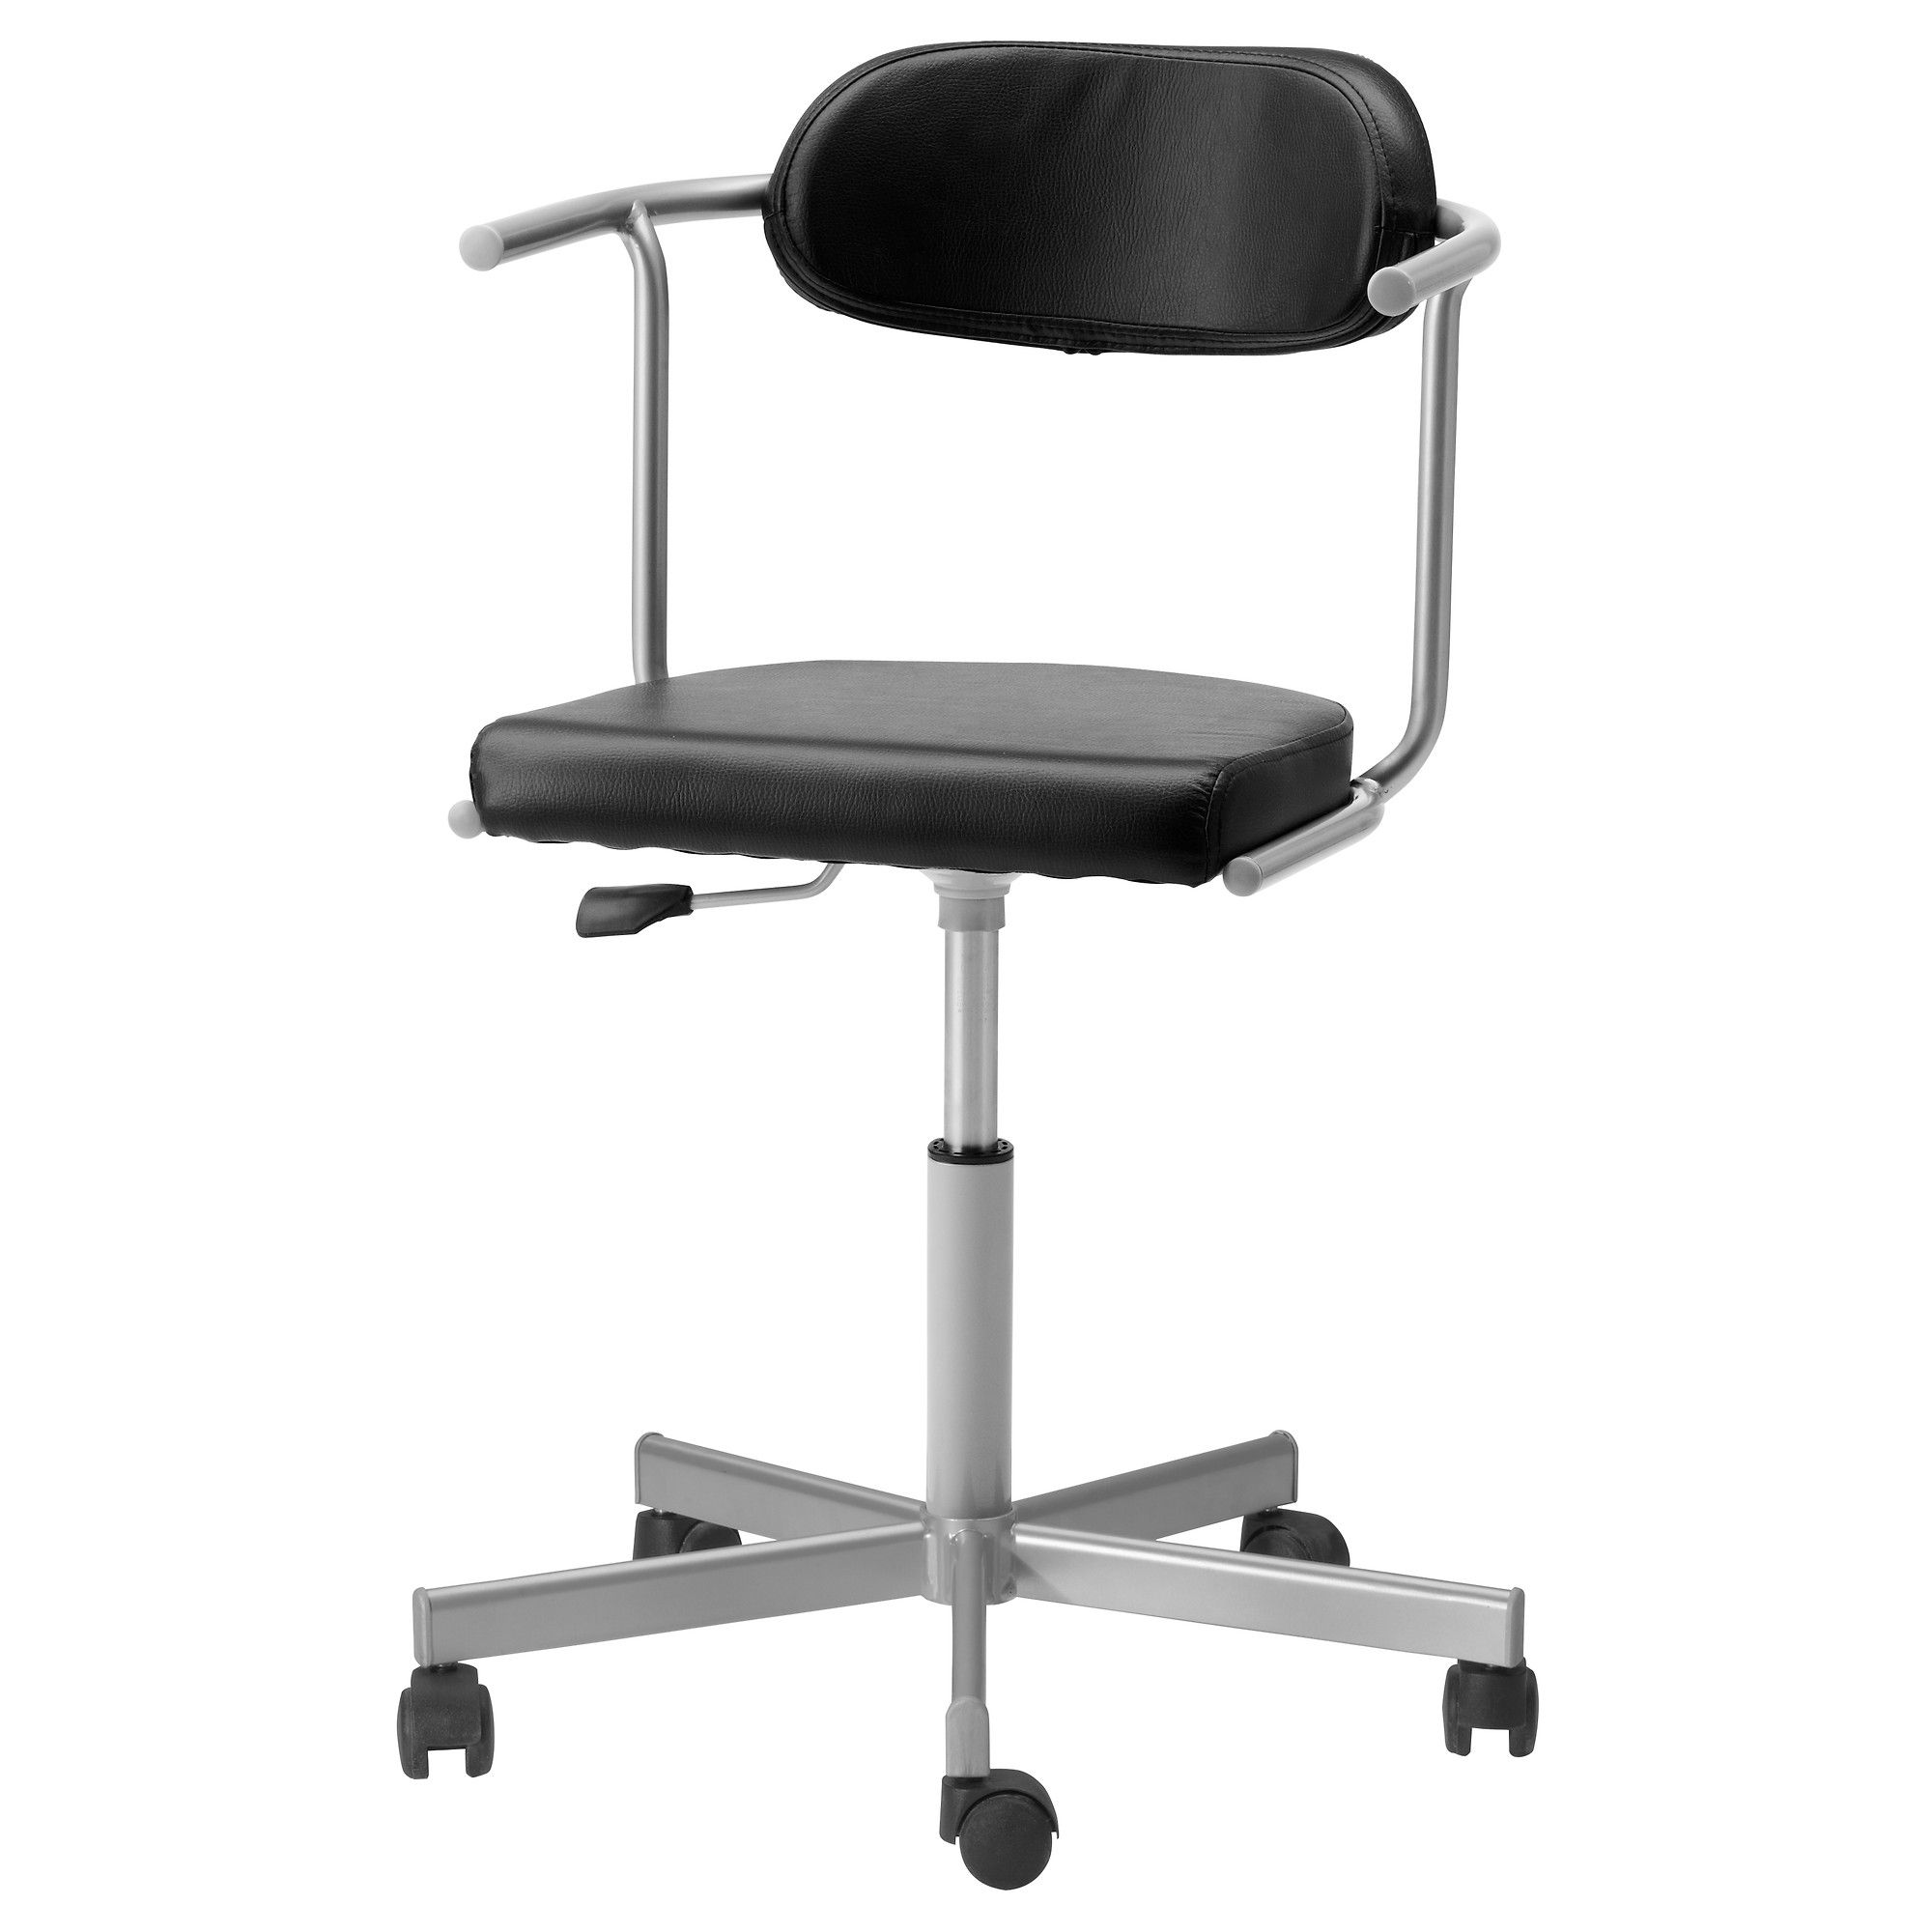 Ikea Sofa With Wheels Custom Newport Beach Rutger Jules Swivel Chair Casters O F I C